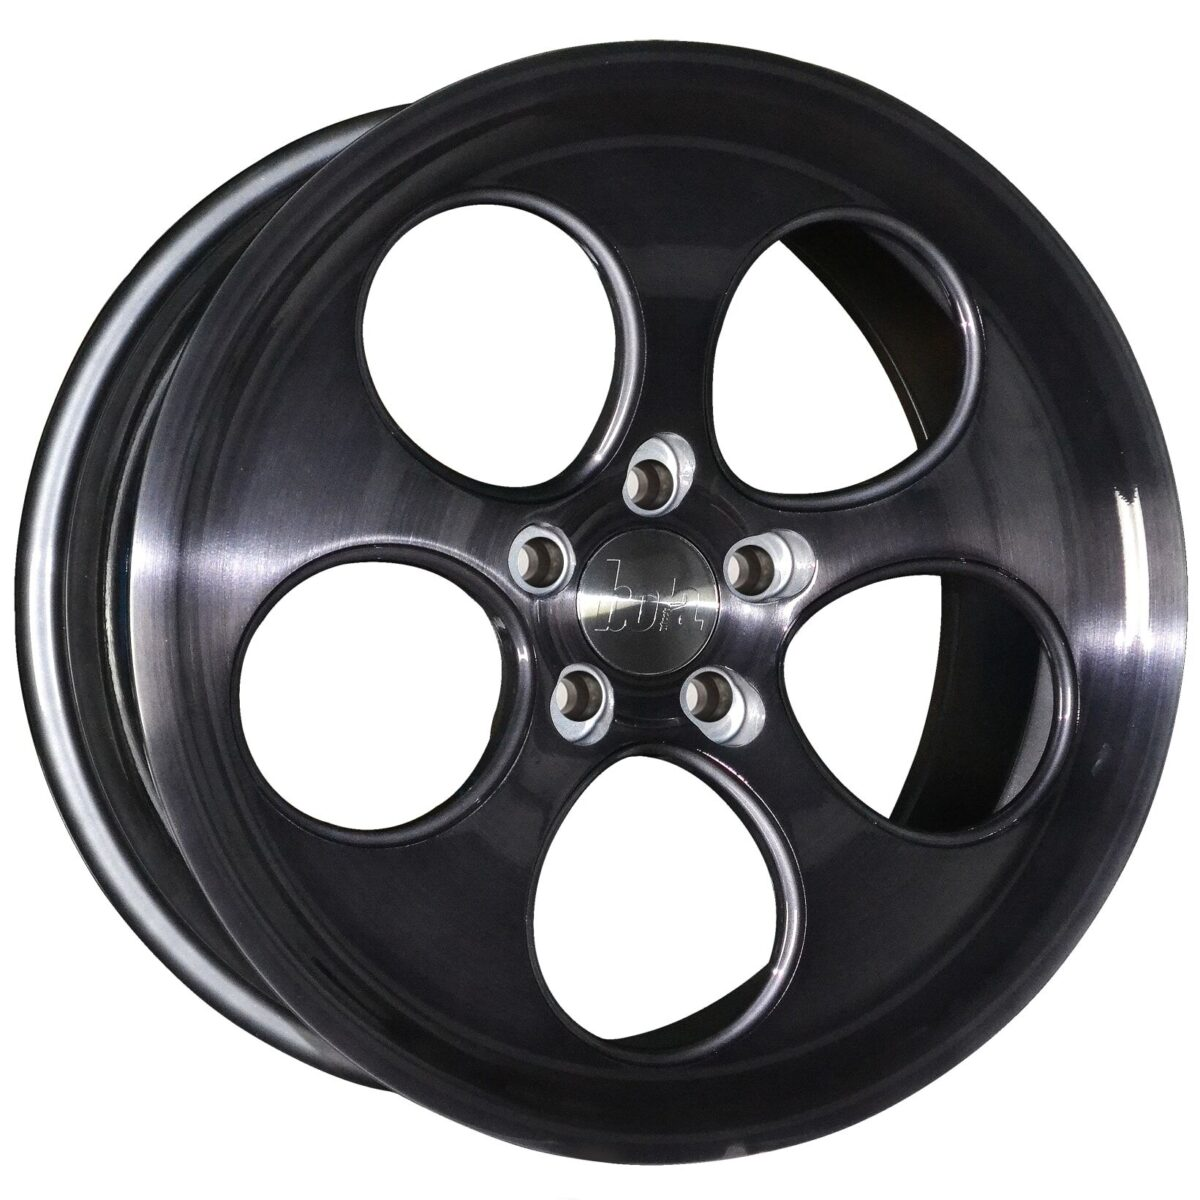 "18"" BOLA B5 Wheels - Black Brushed Polished Face - VW / Audi / Mercedes - 5x112"